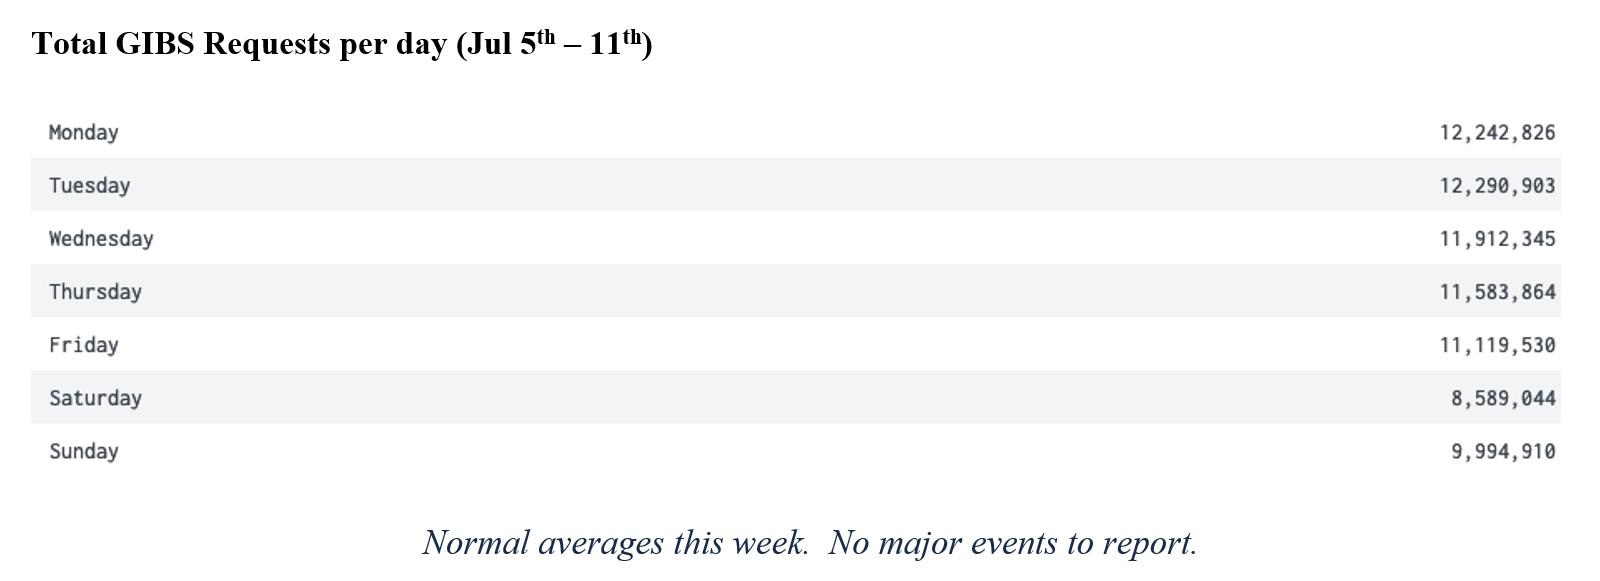 GIBS Metrics 2 3-18-21